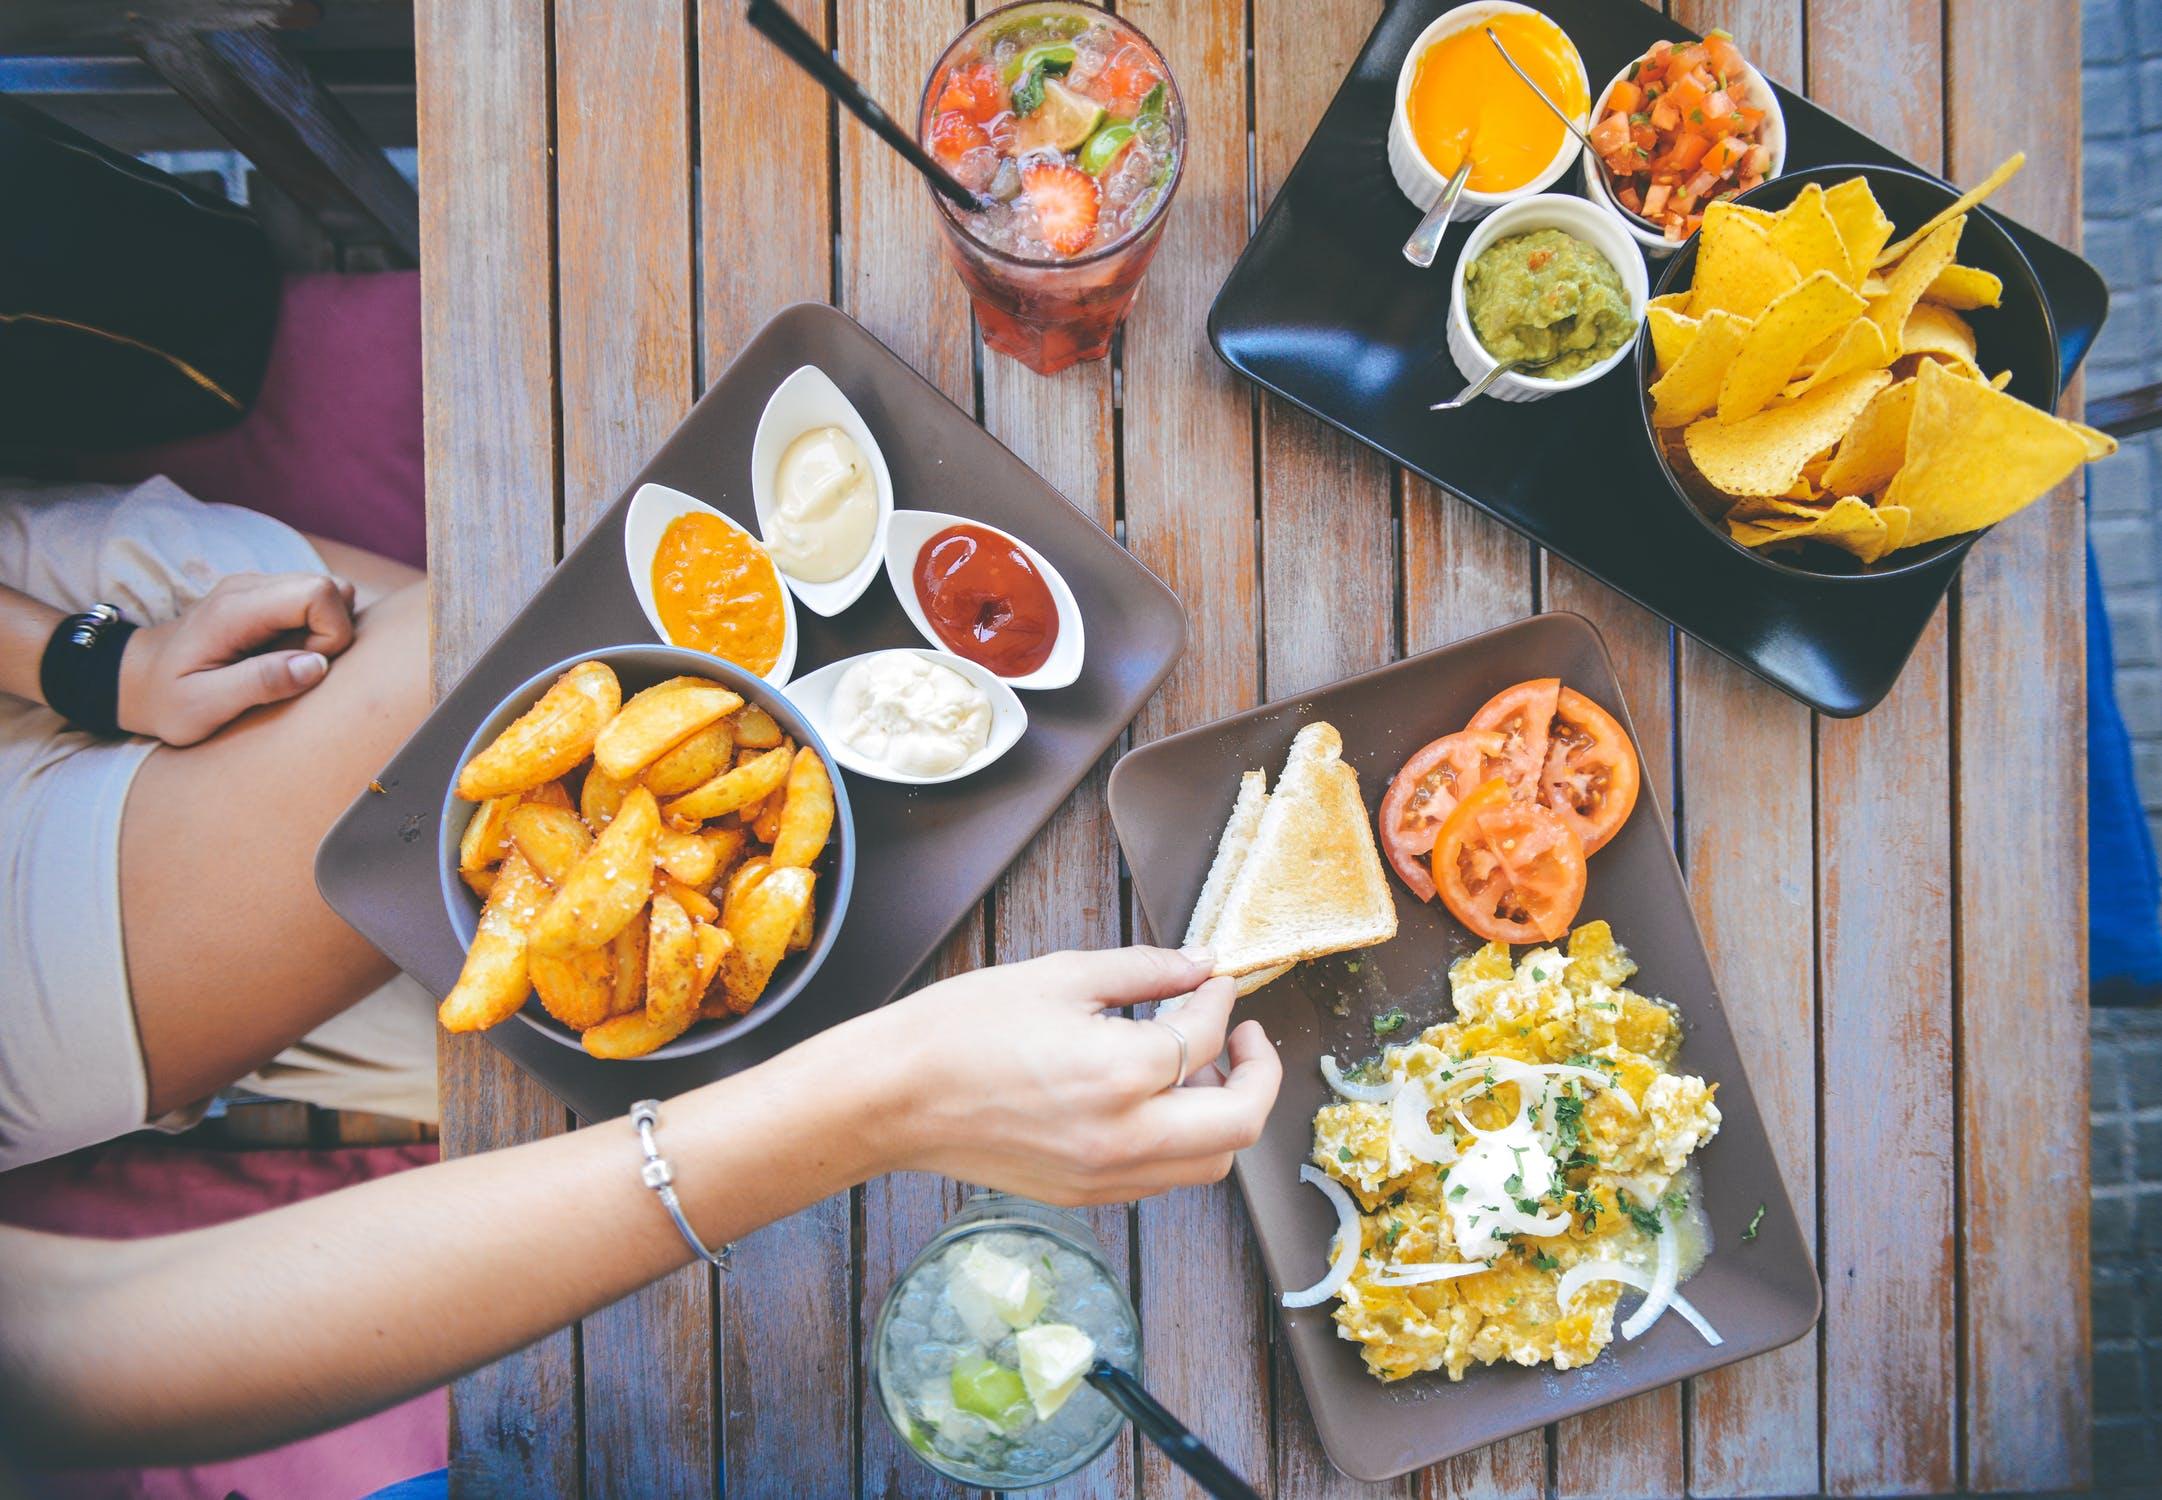 food salad restaurant person